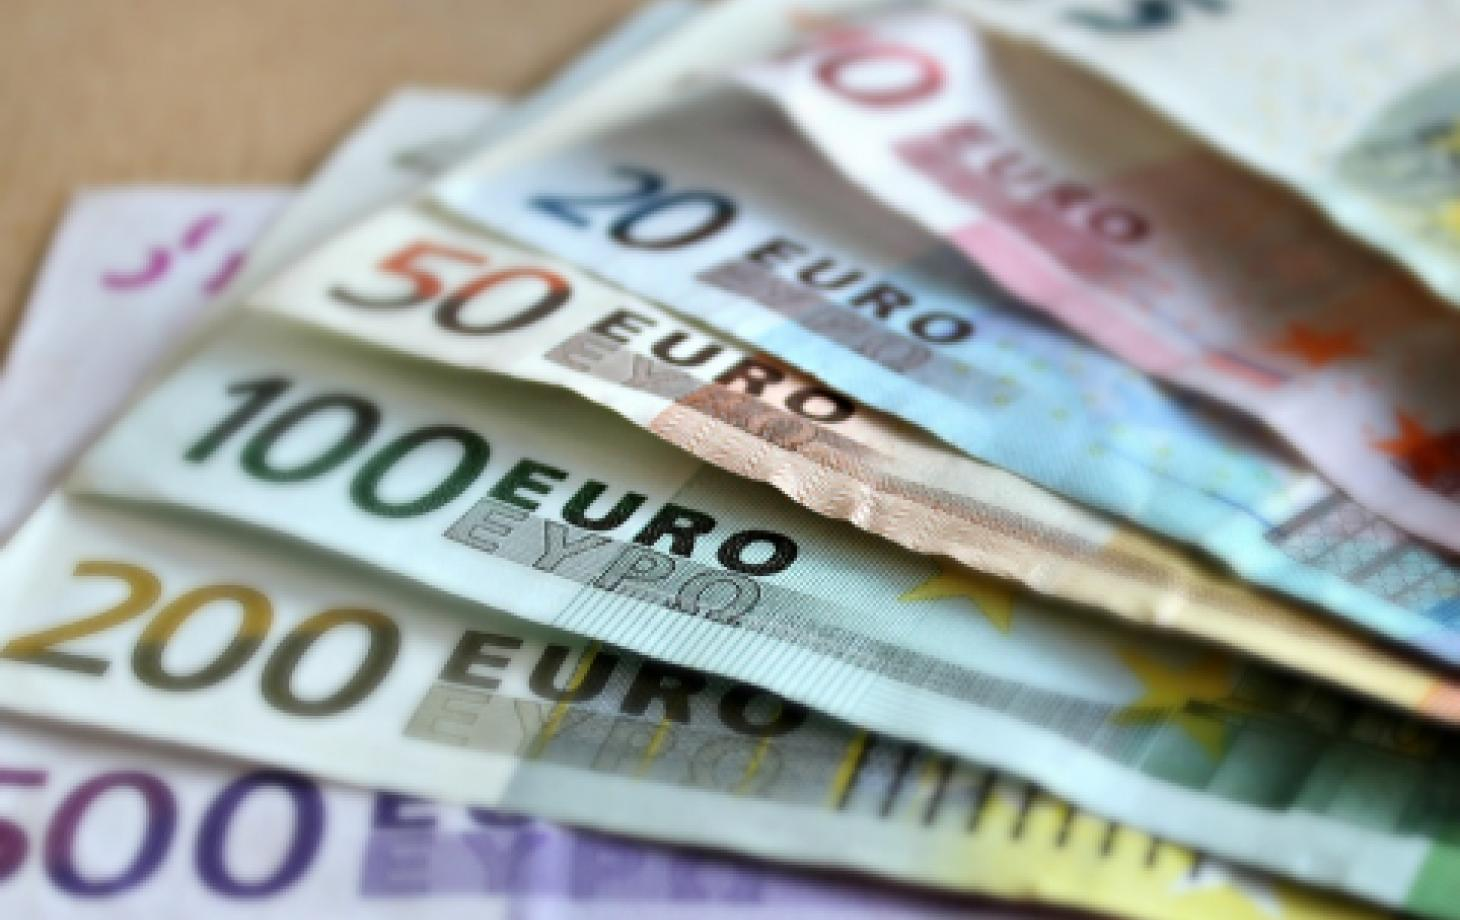 деньги евро взятка